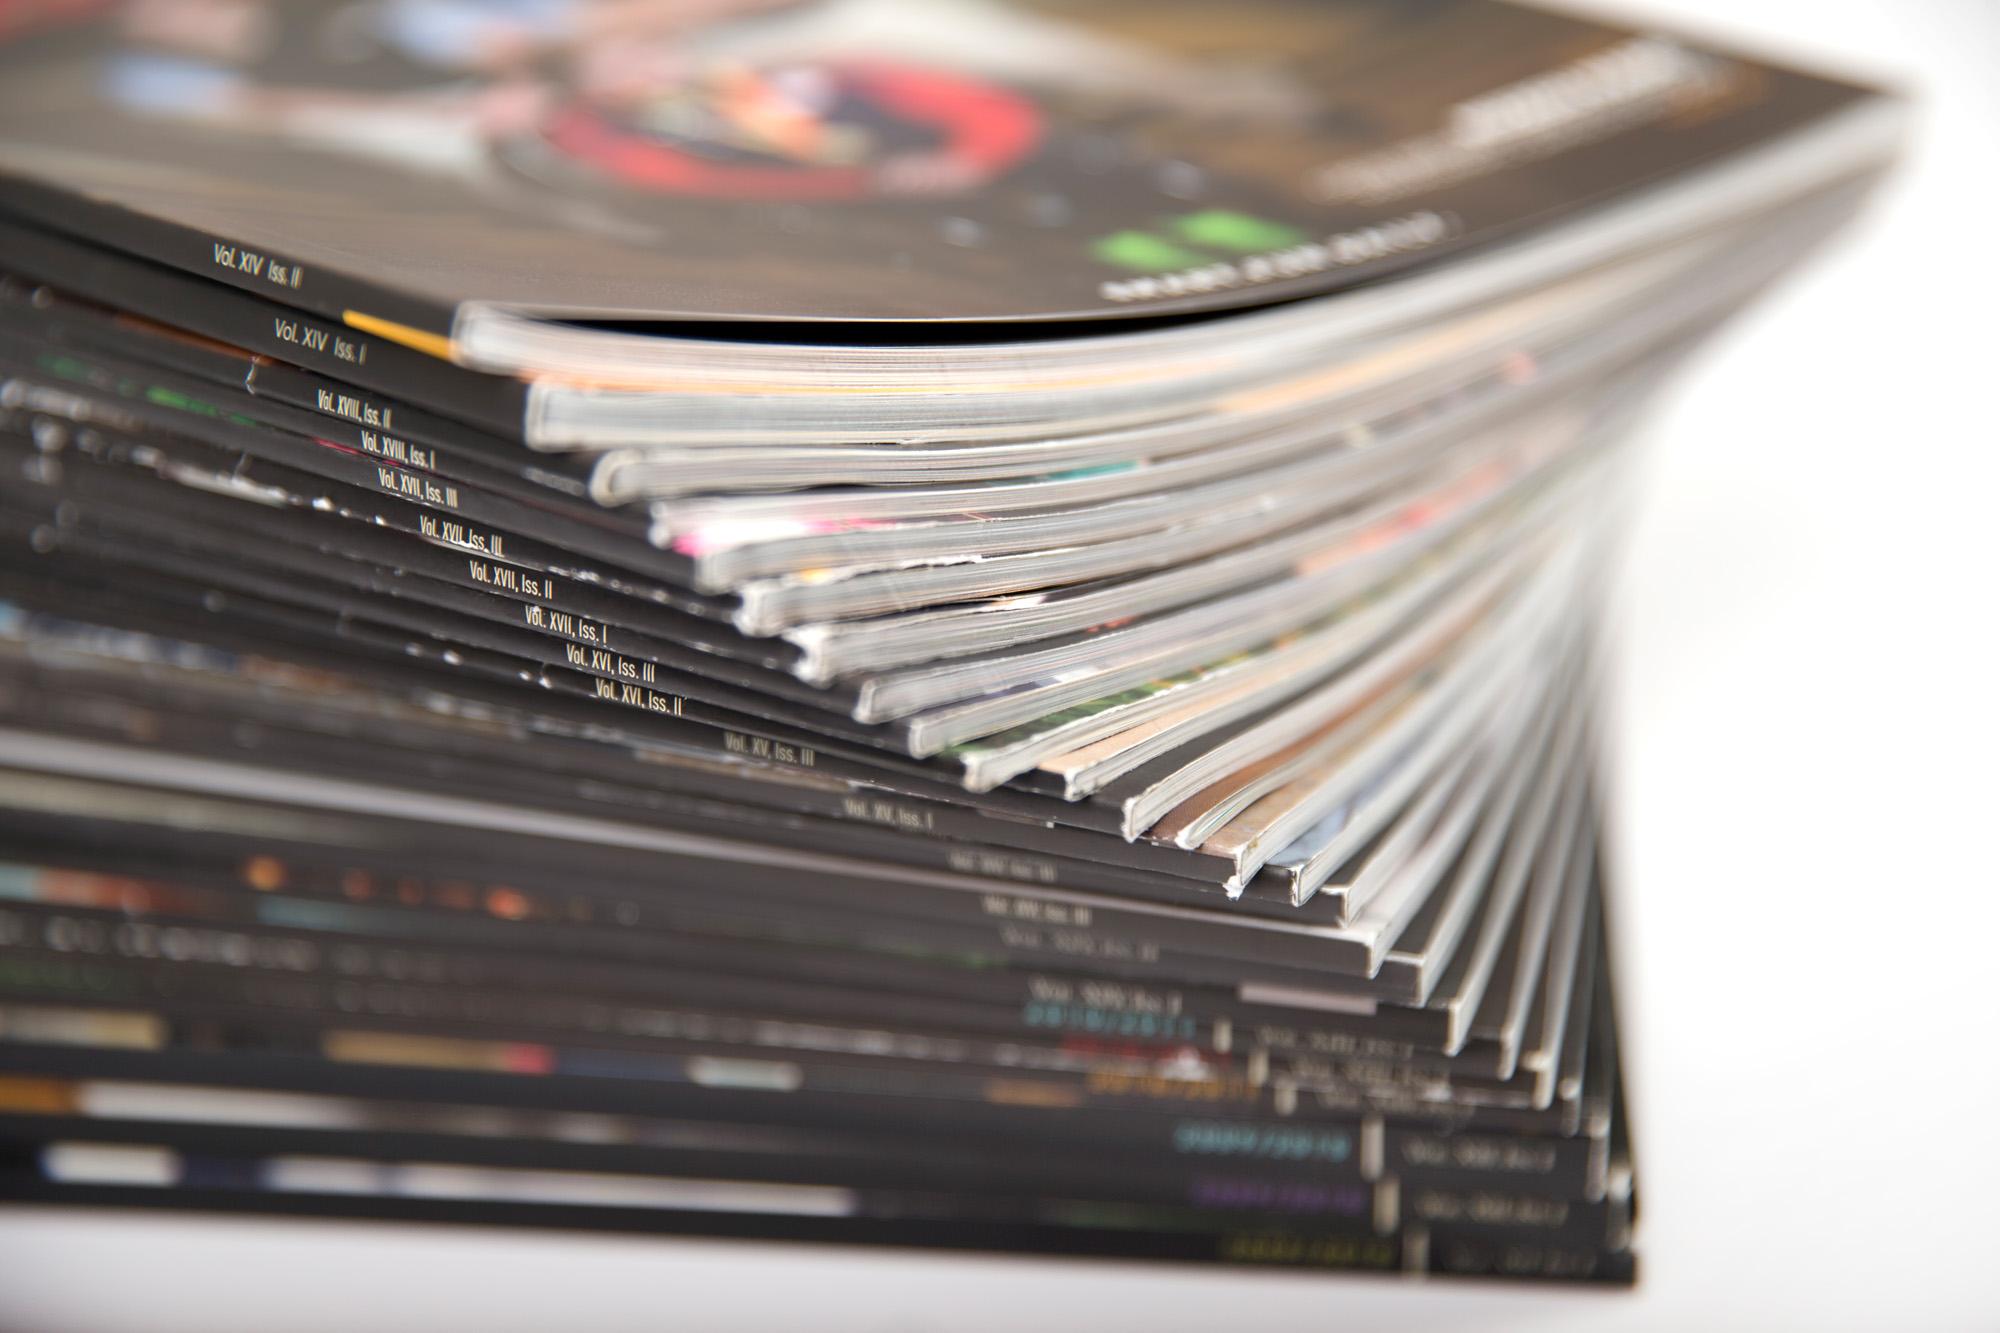 T.J. Thomson, studio, studio shoot, mrn, materials, print materials, brochures, zoulife menu, menu, magazines, info guides,